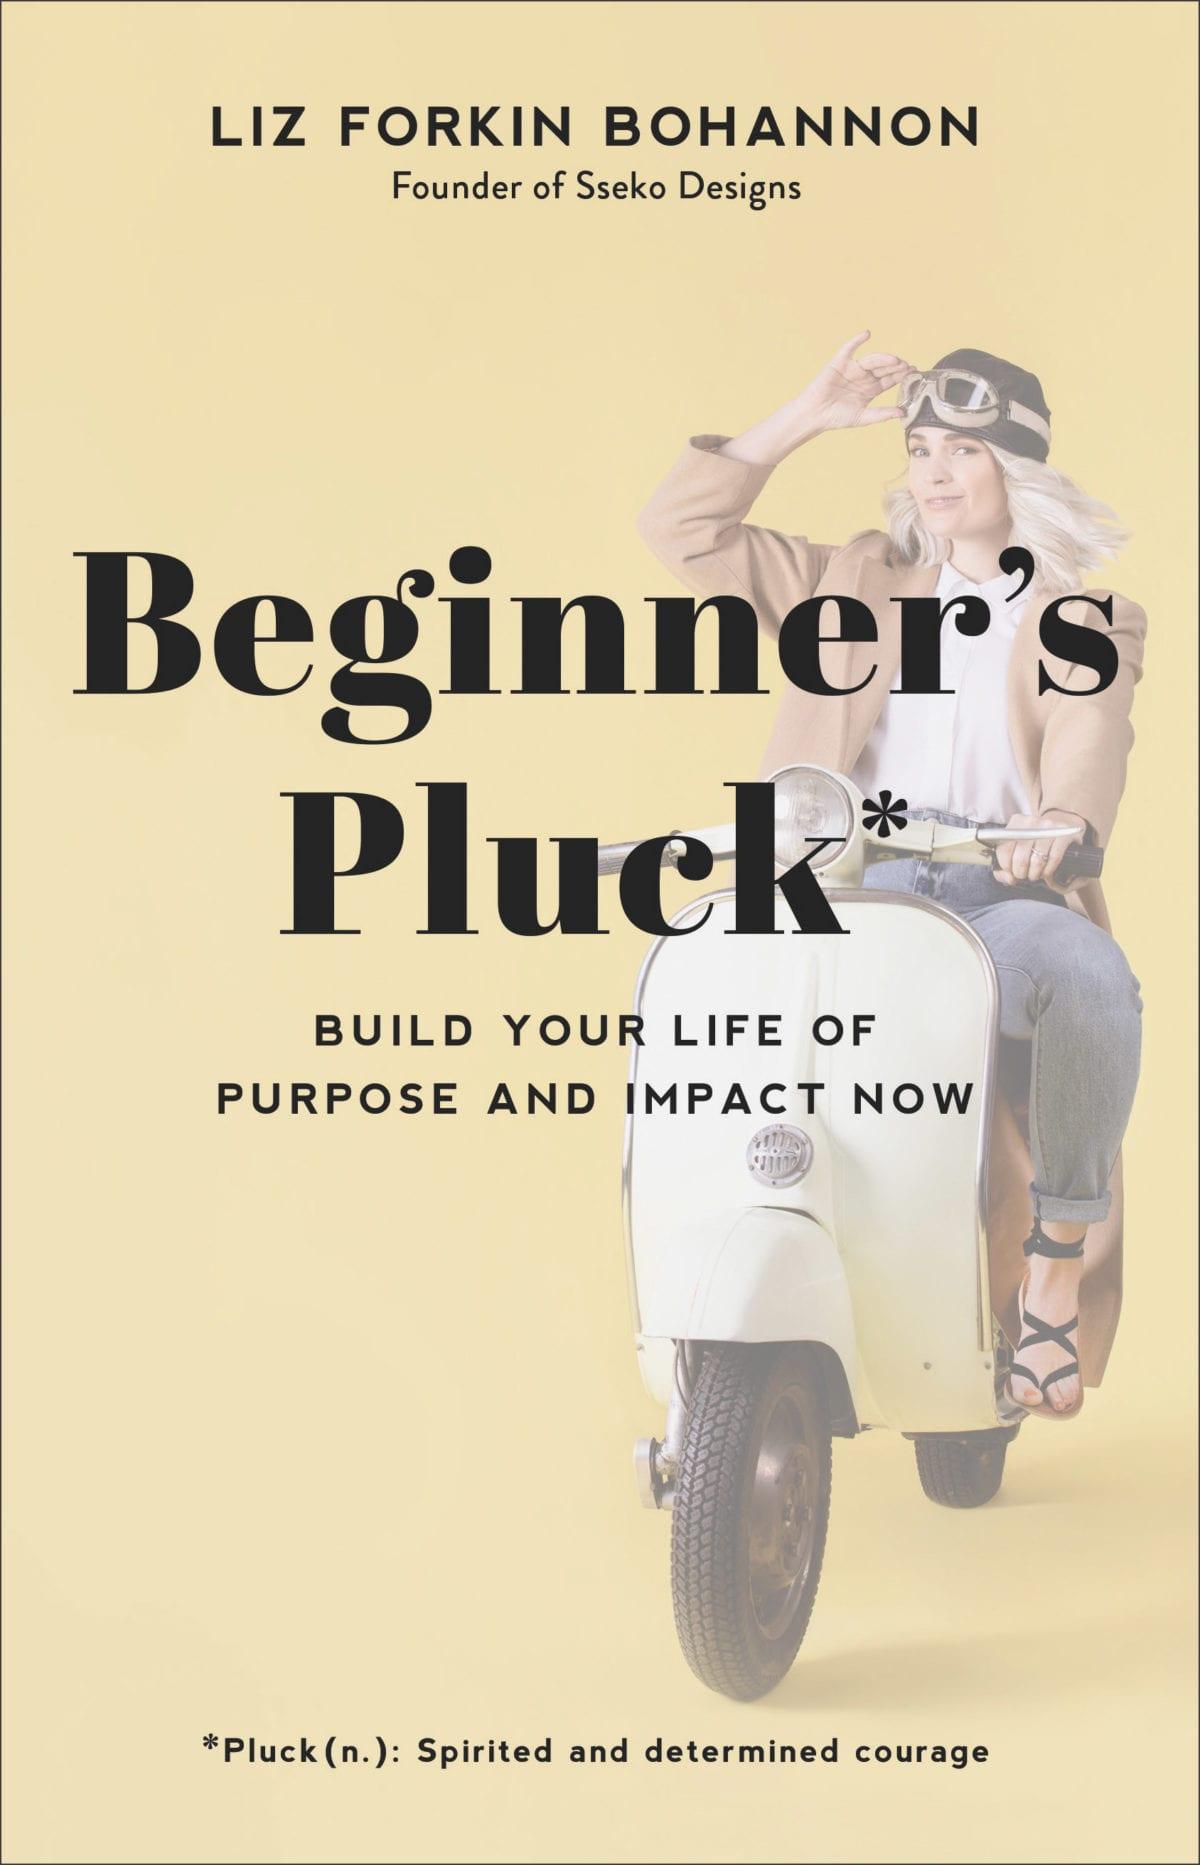 Liz writes Beginners Pluck.